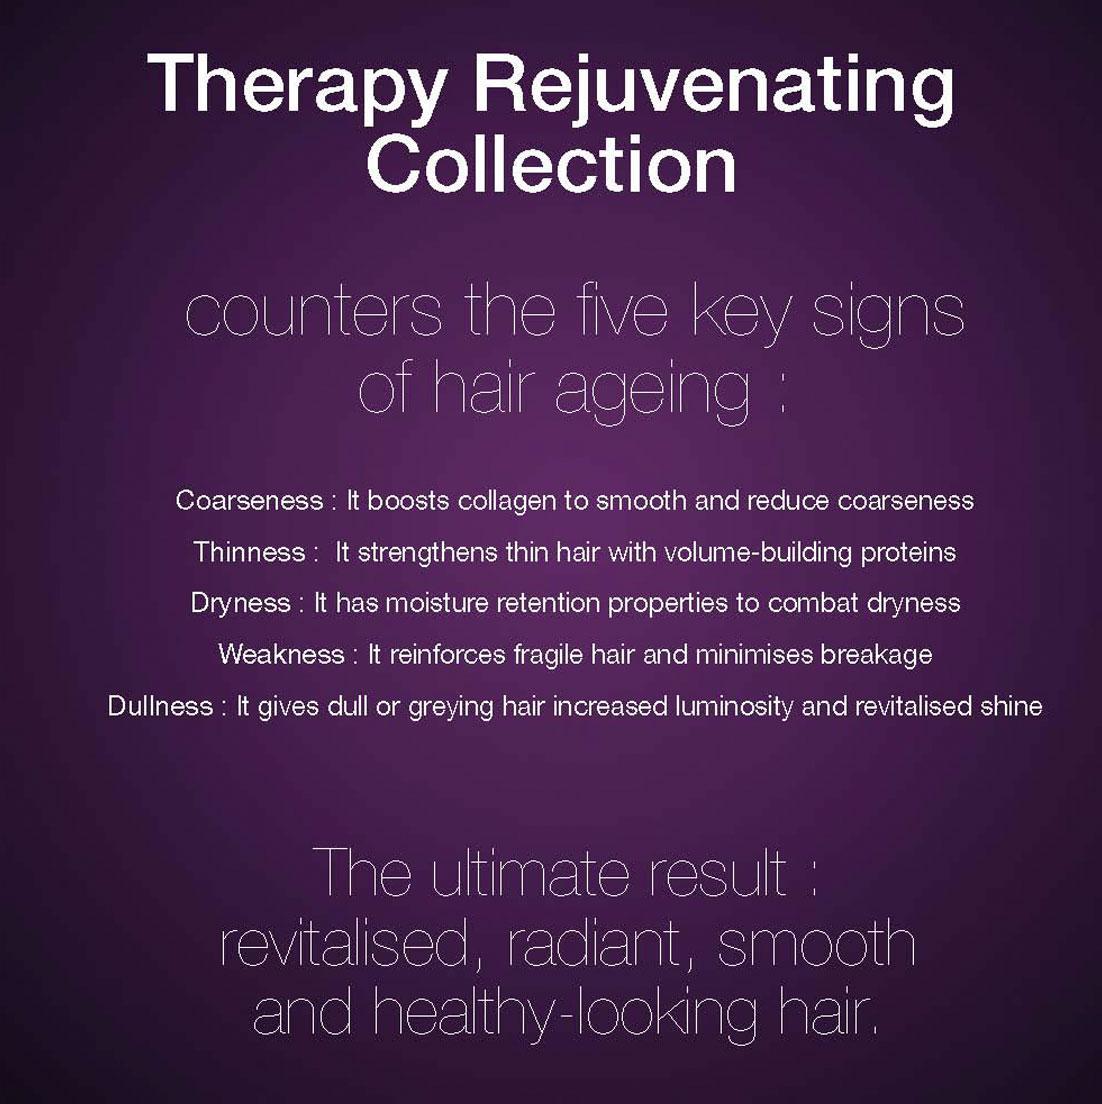 587.9-label-m-therapy-rejuvenating-2-pg-35.jpg